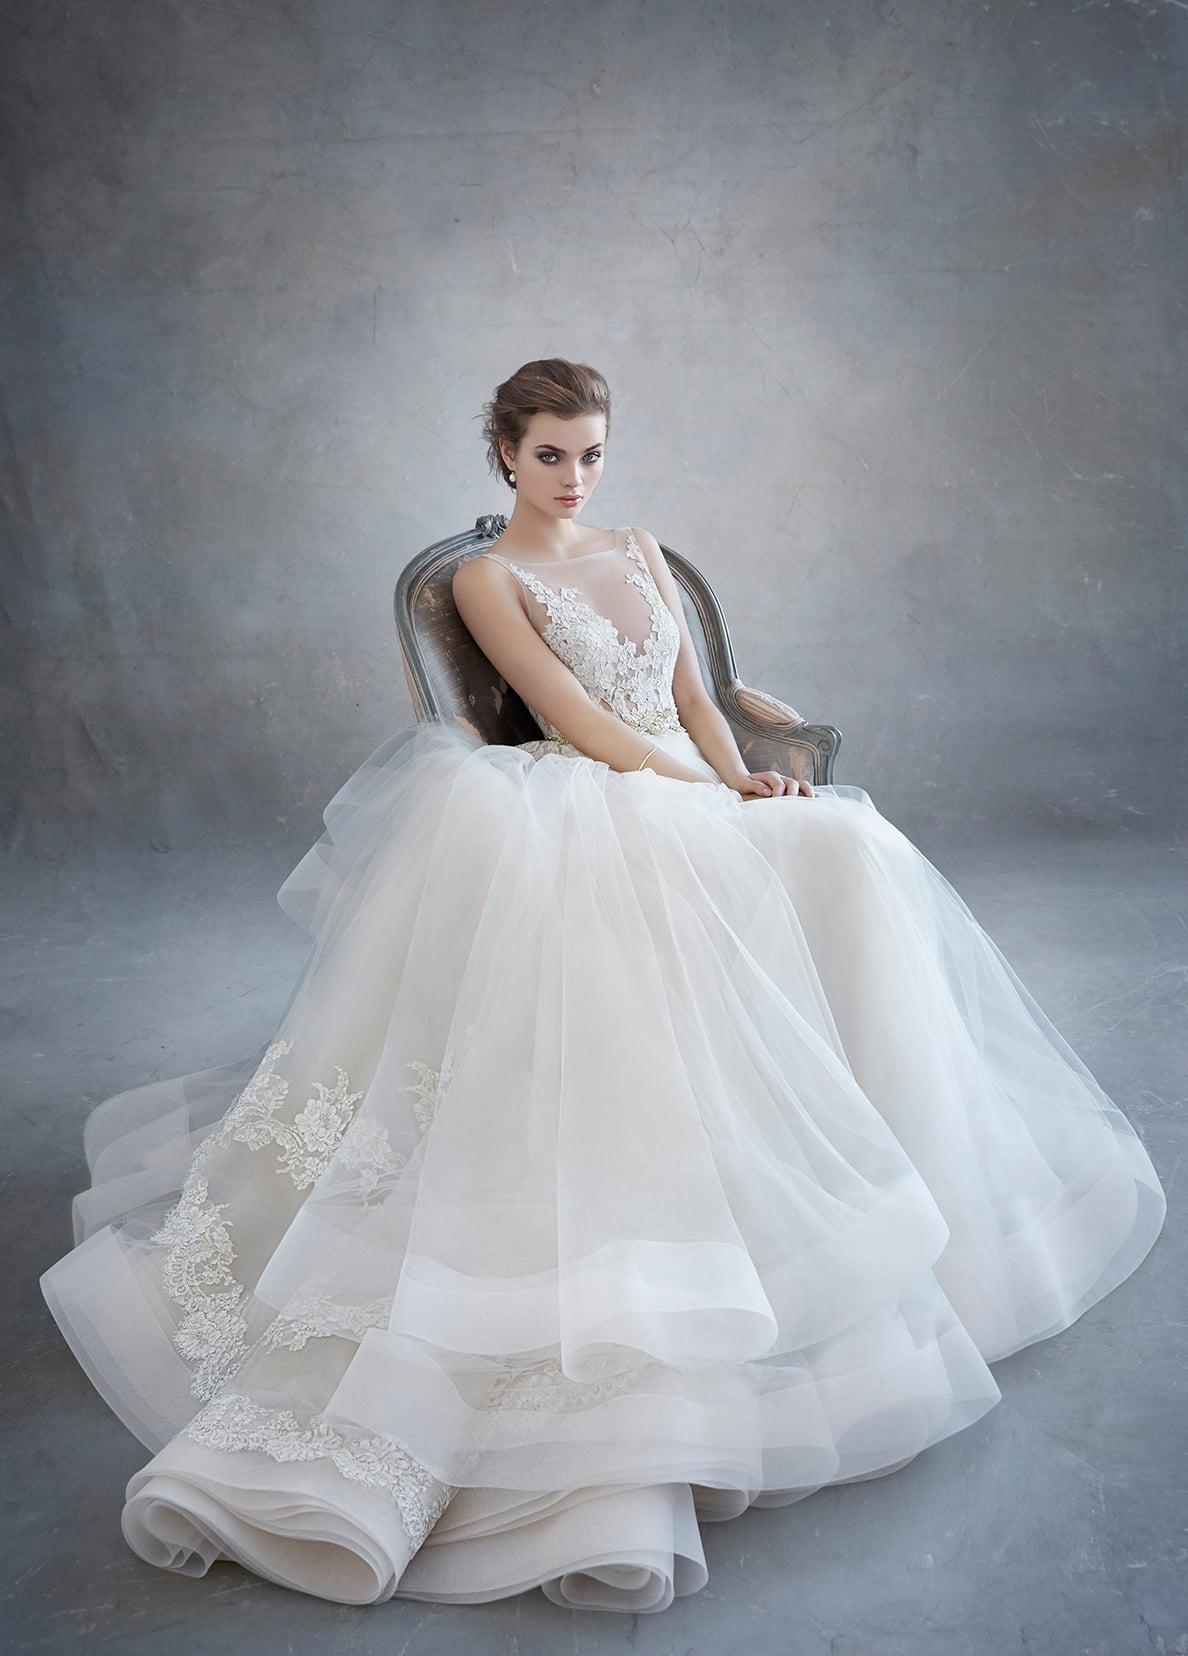 lazaro-bridal-tulle-ball-alencon-lace-metallic-beaded-natural-floral-horsehair-chapel-3607_x4.jpg